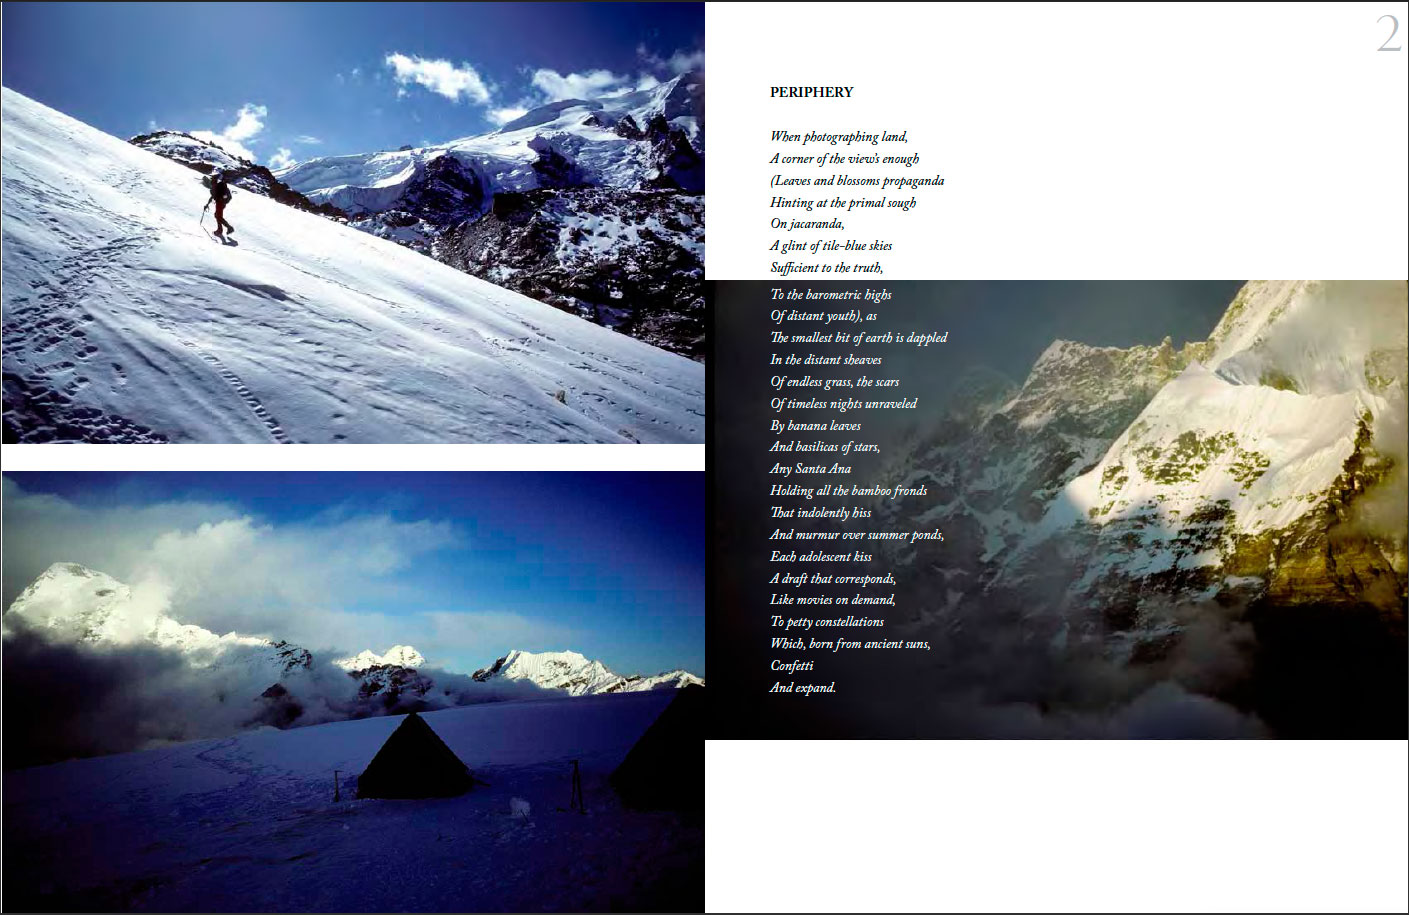 Peter-himalayas-spread-5-OP.jpg